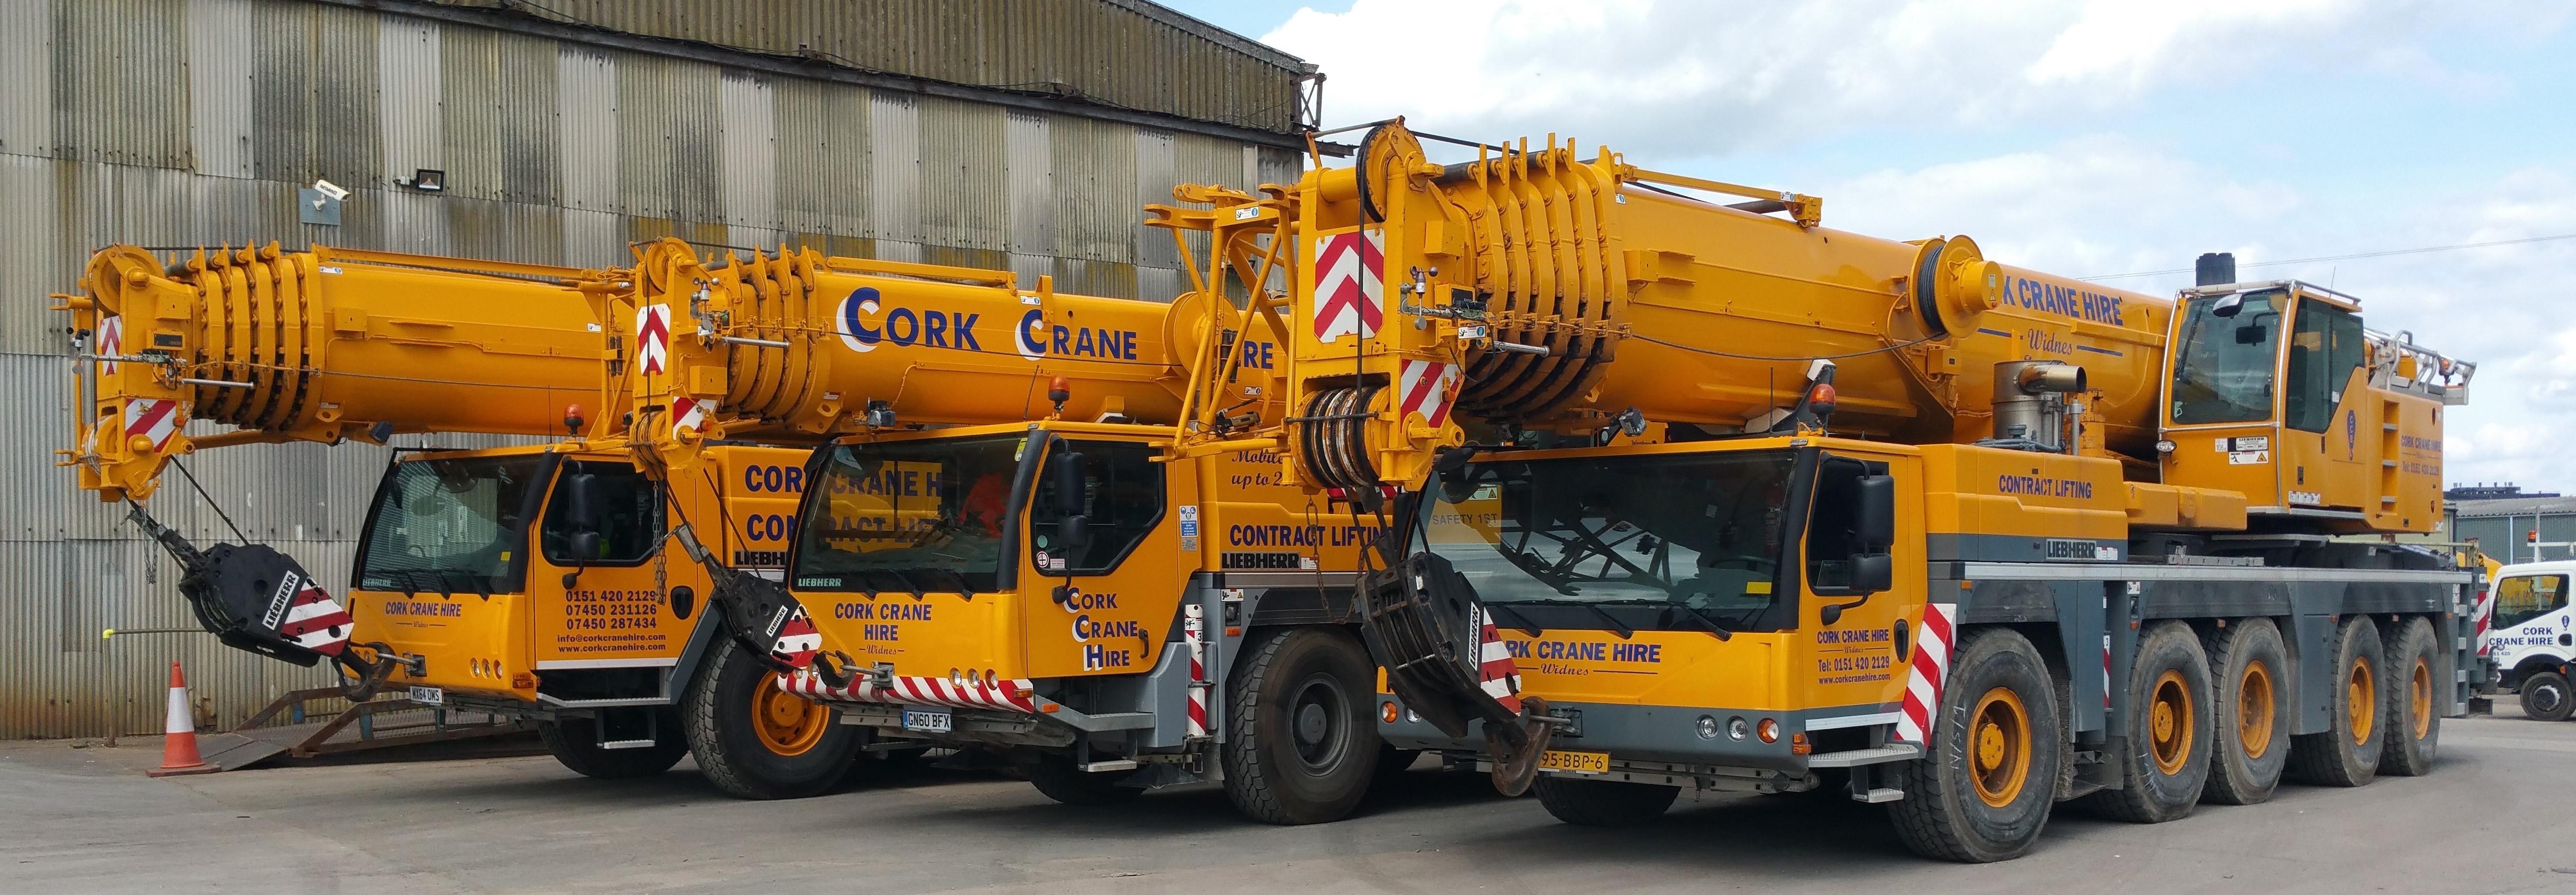 Cork Crane Hire Ltd | LinkedIn